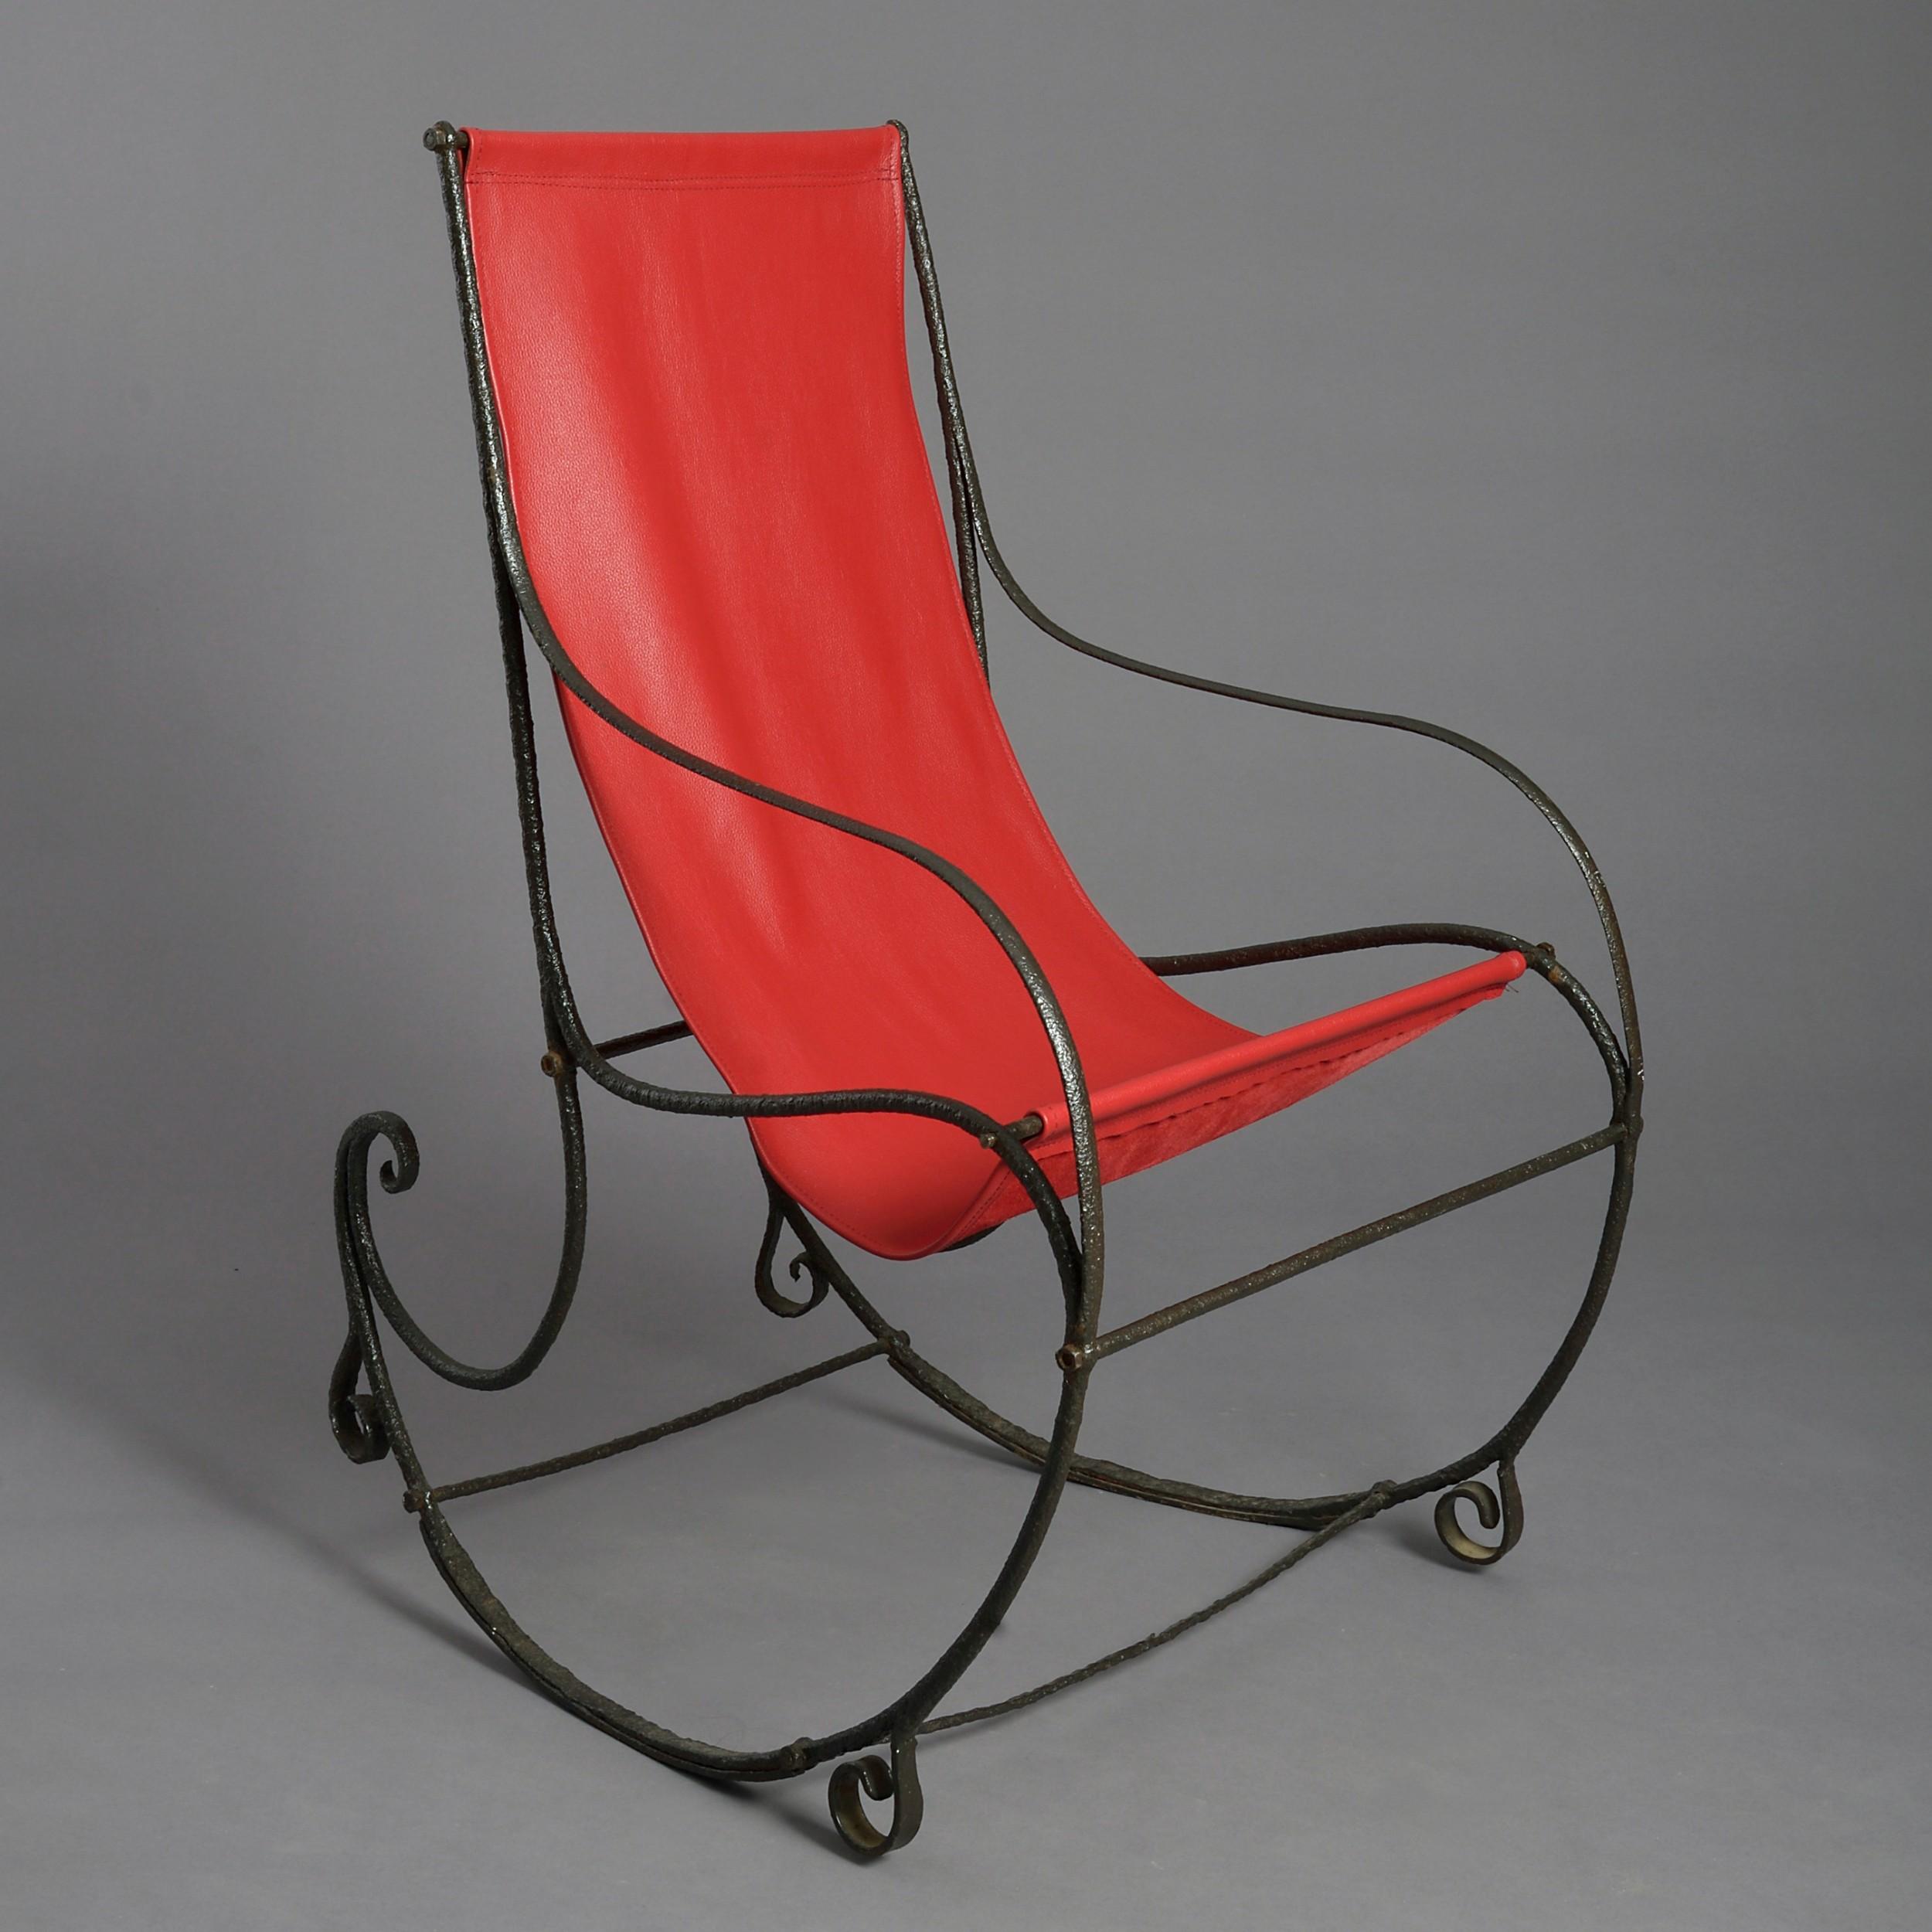 19th century regency period cast iron rocking chair